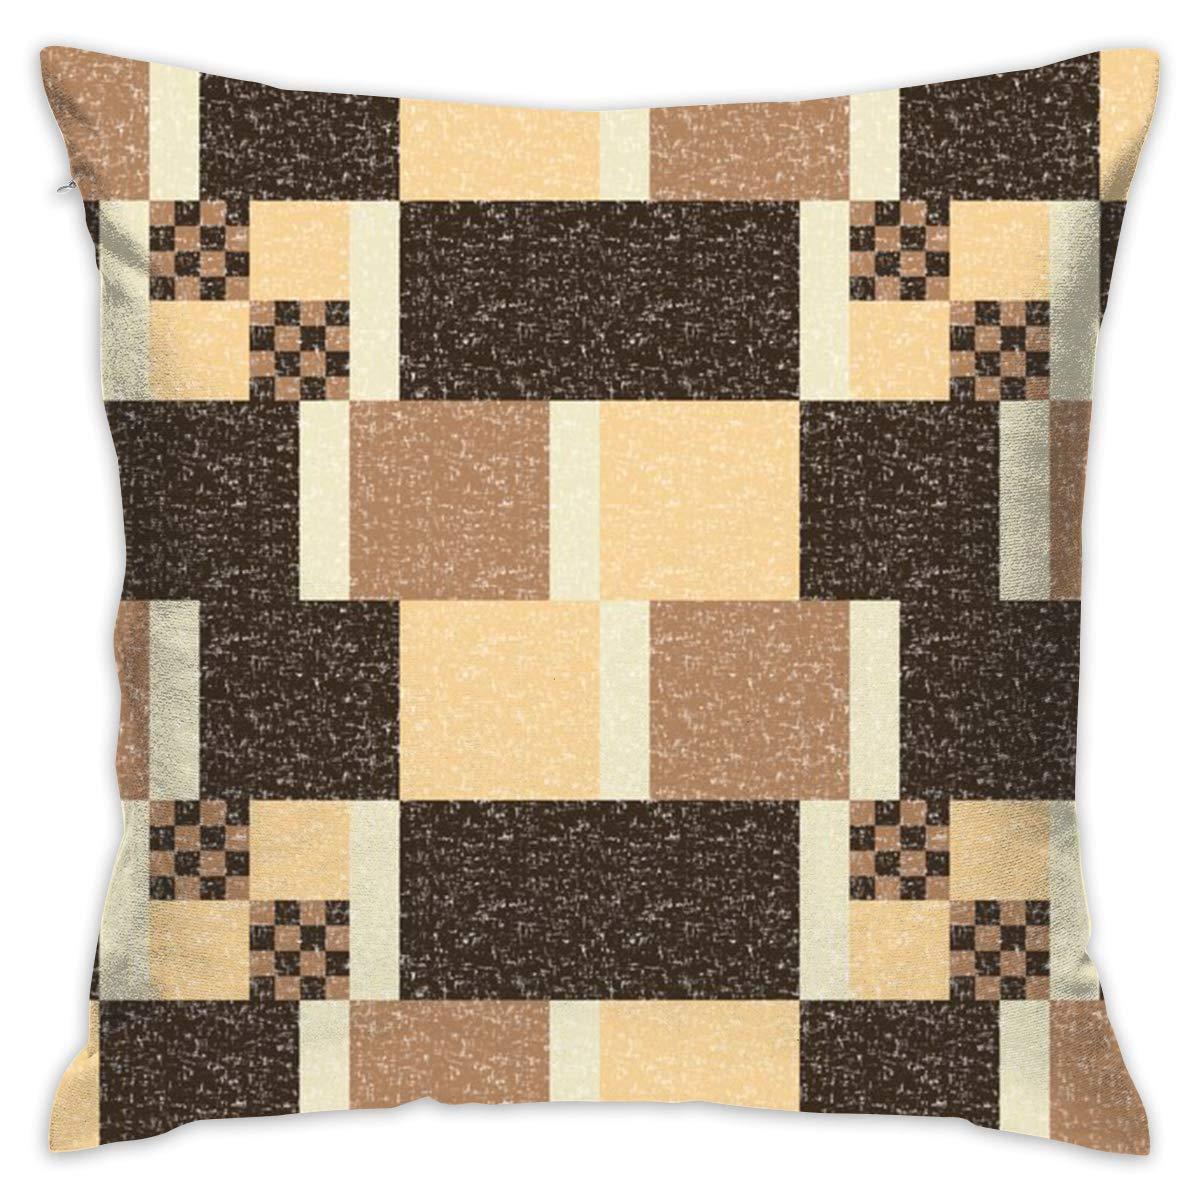 Amazon.com: Eson J Bauhaus Chocolate with Racing Flags by ...